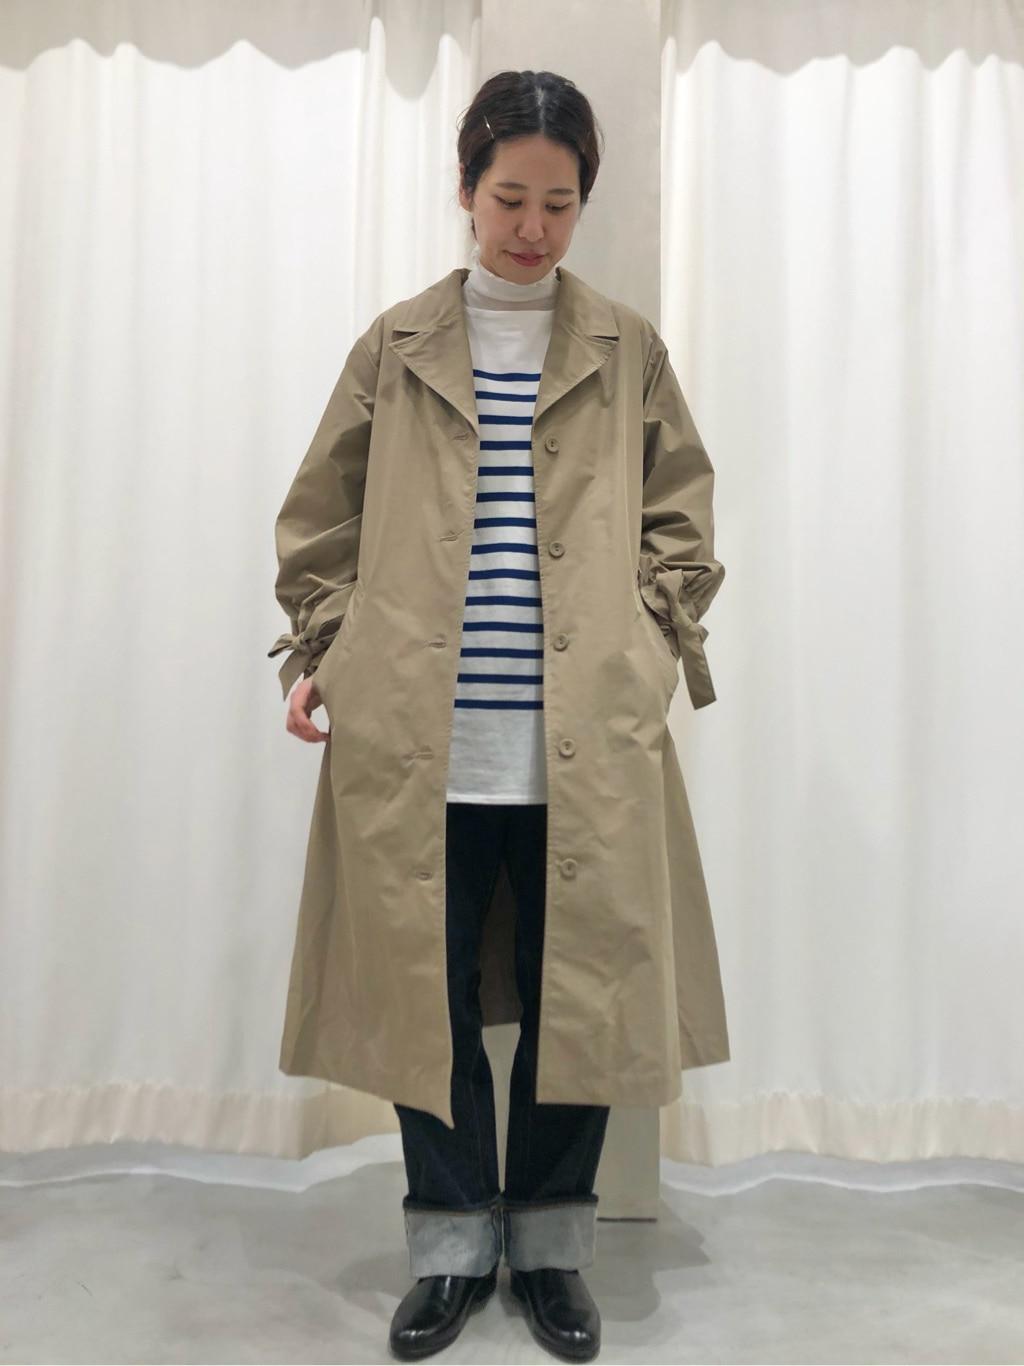 CHILD WOMAN , PAR ICI 東京スカイツリータウン・ソラマチ 2021.02.19